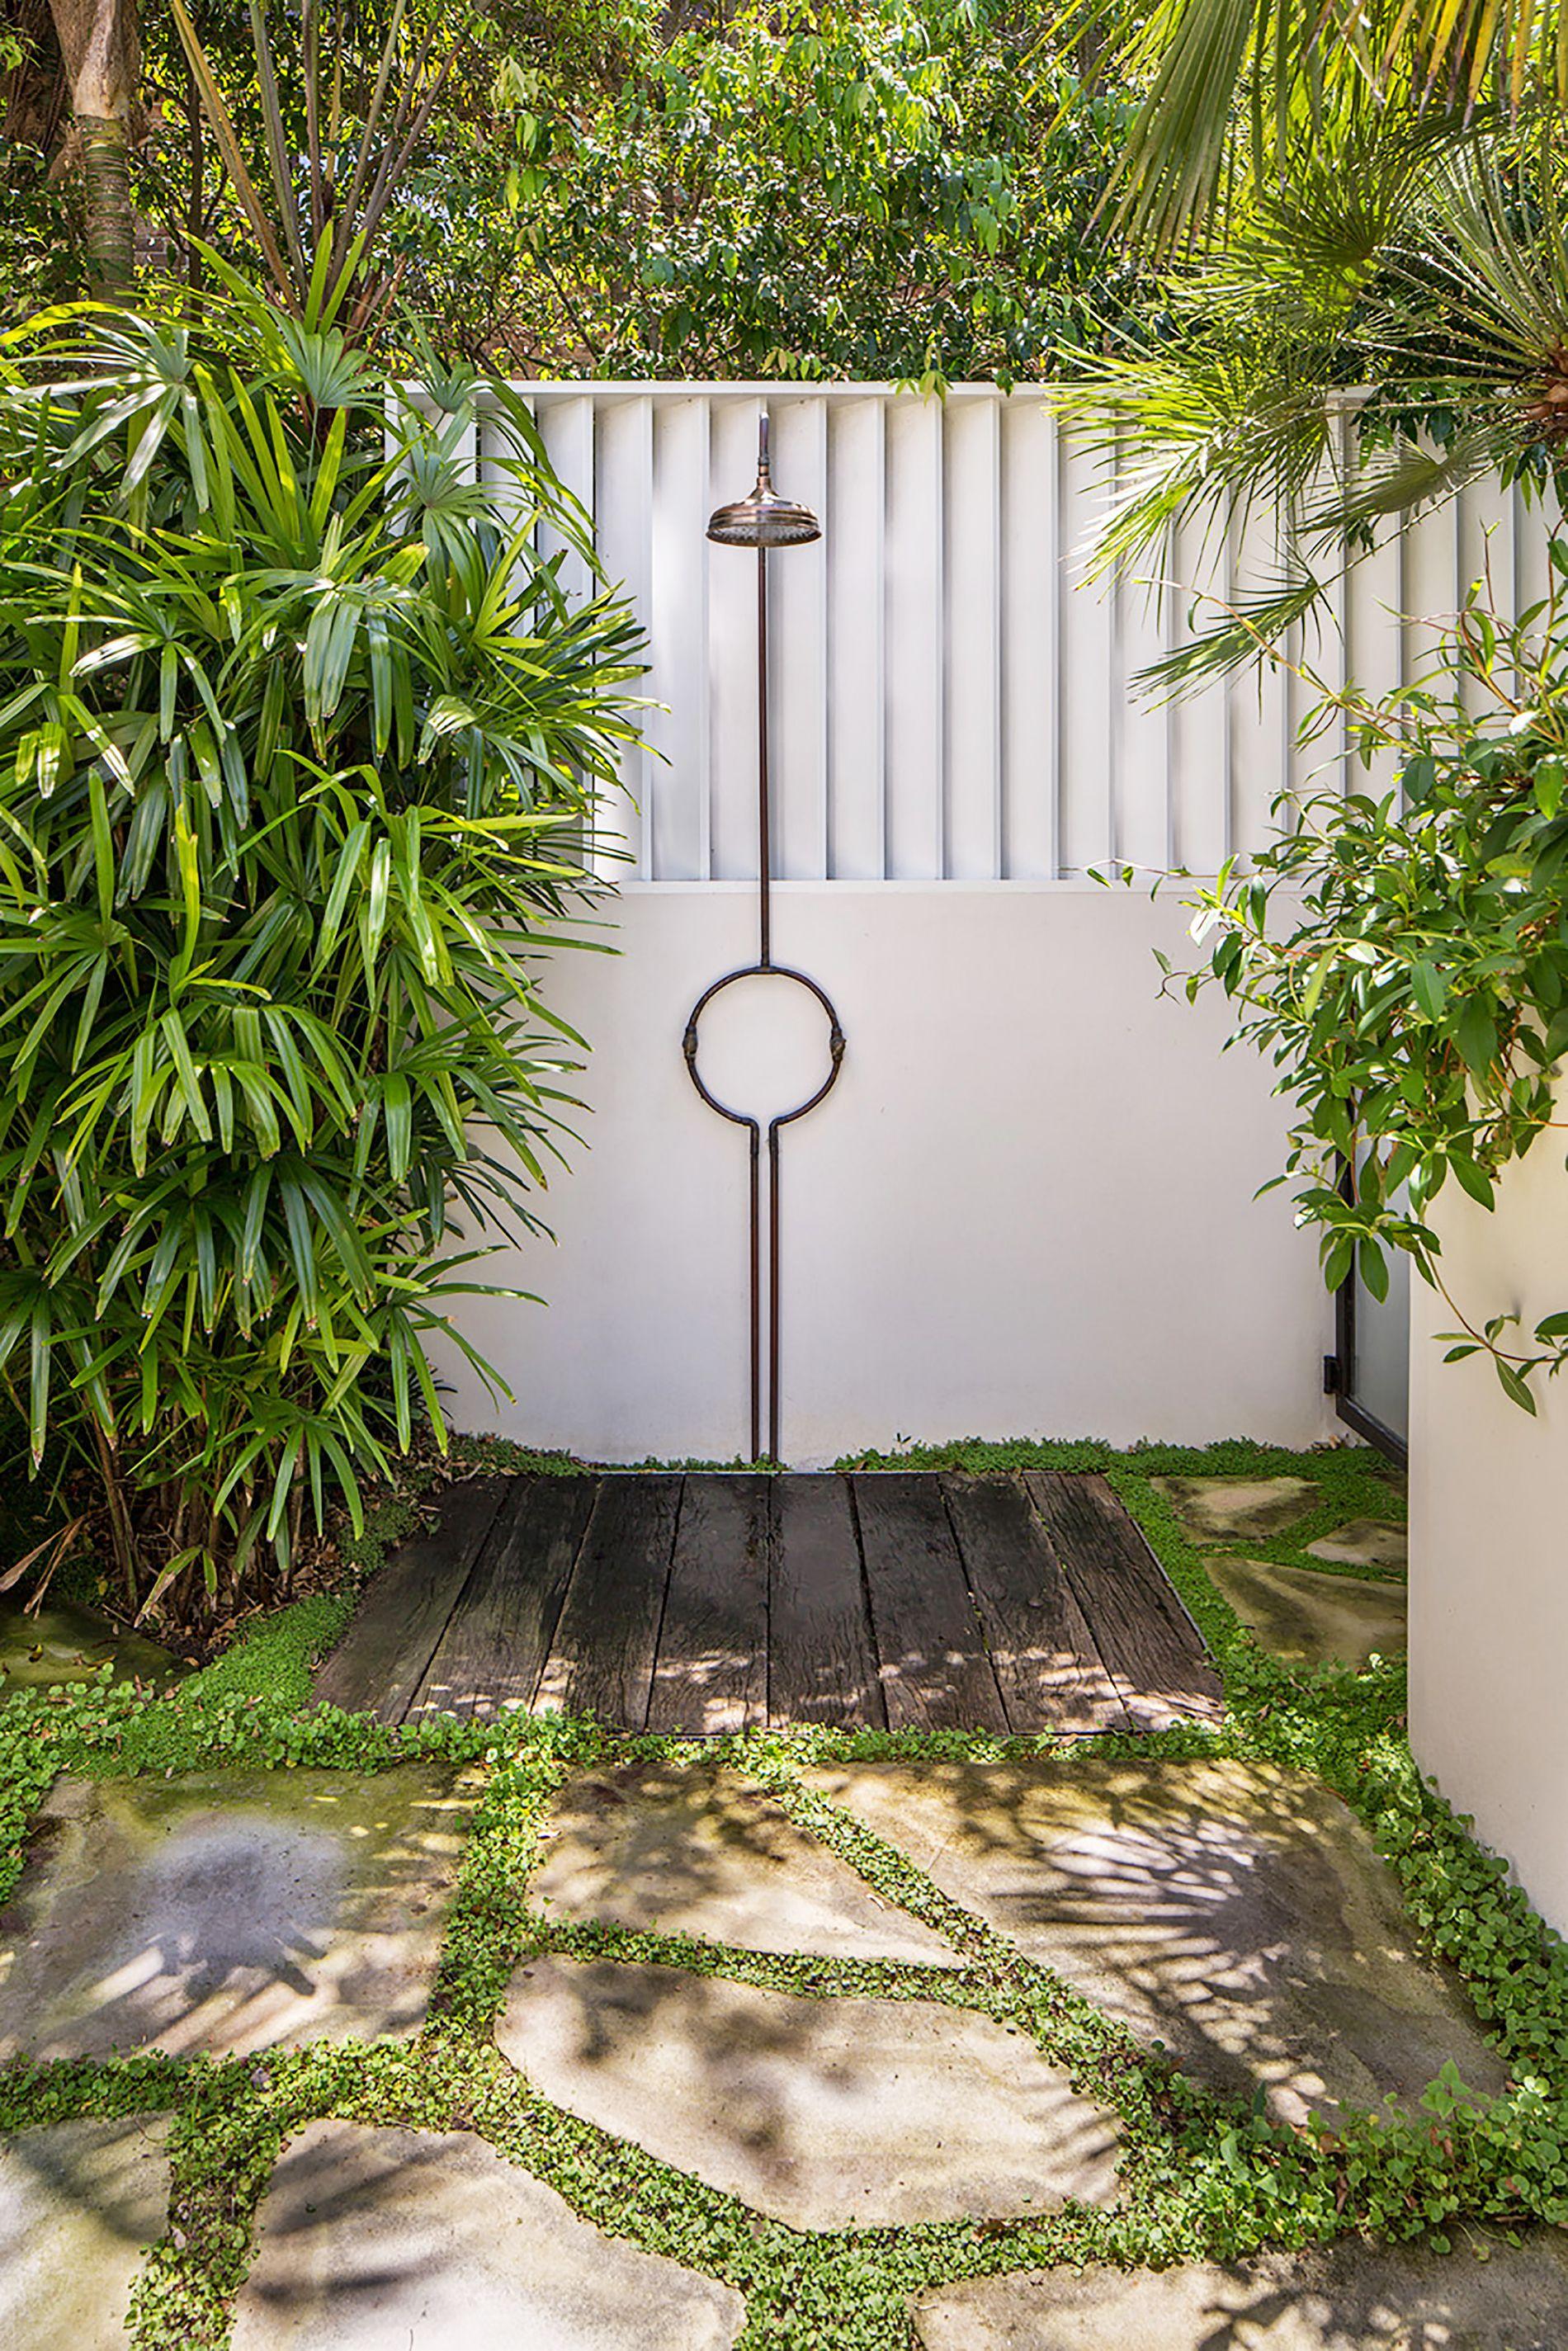 60+ Best Bathroom Designs - Photos of Beautiful Bathroom